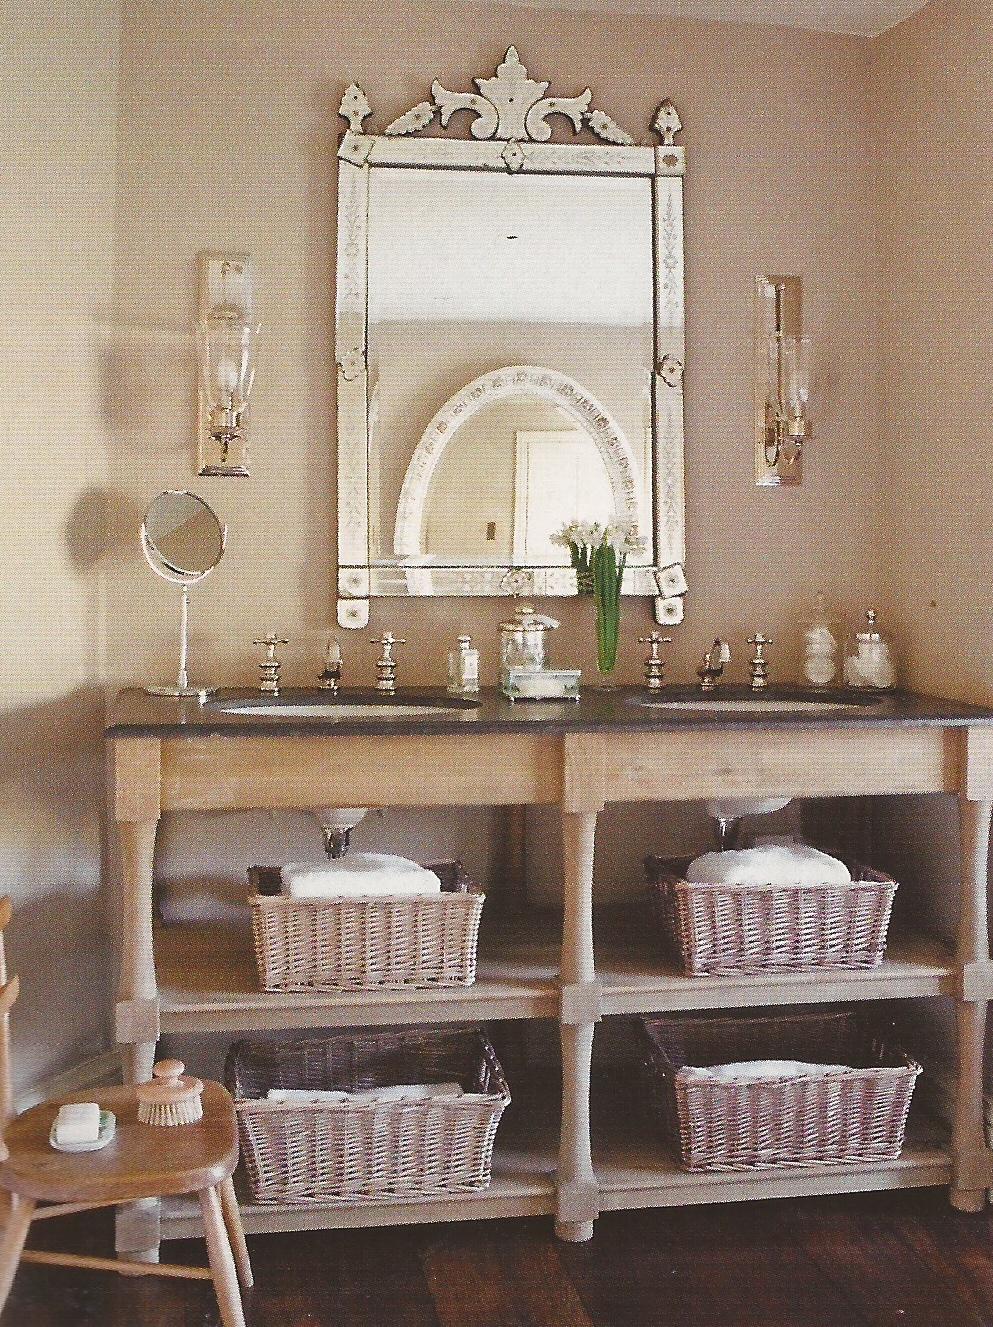 prix du m2 d 39 une v randa. Black Bedroom Furniture Sets. Home Design Ideas